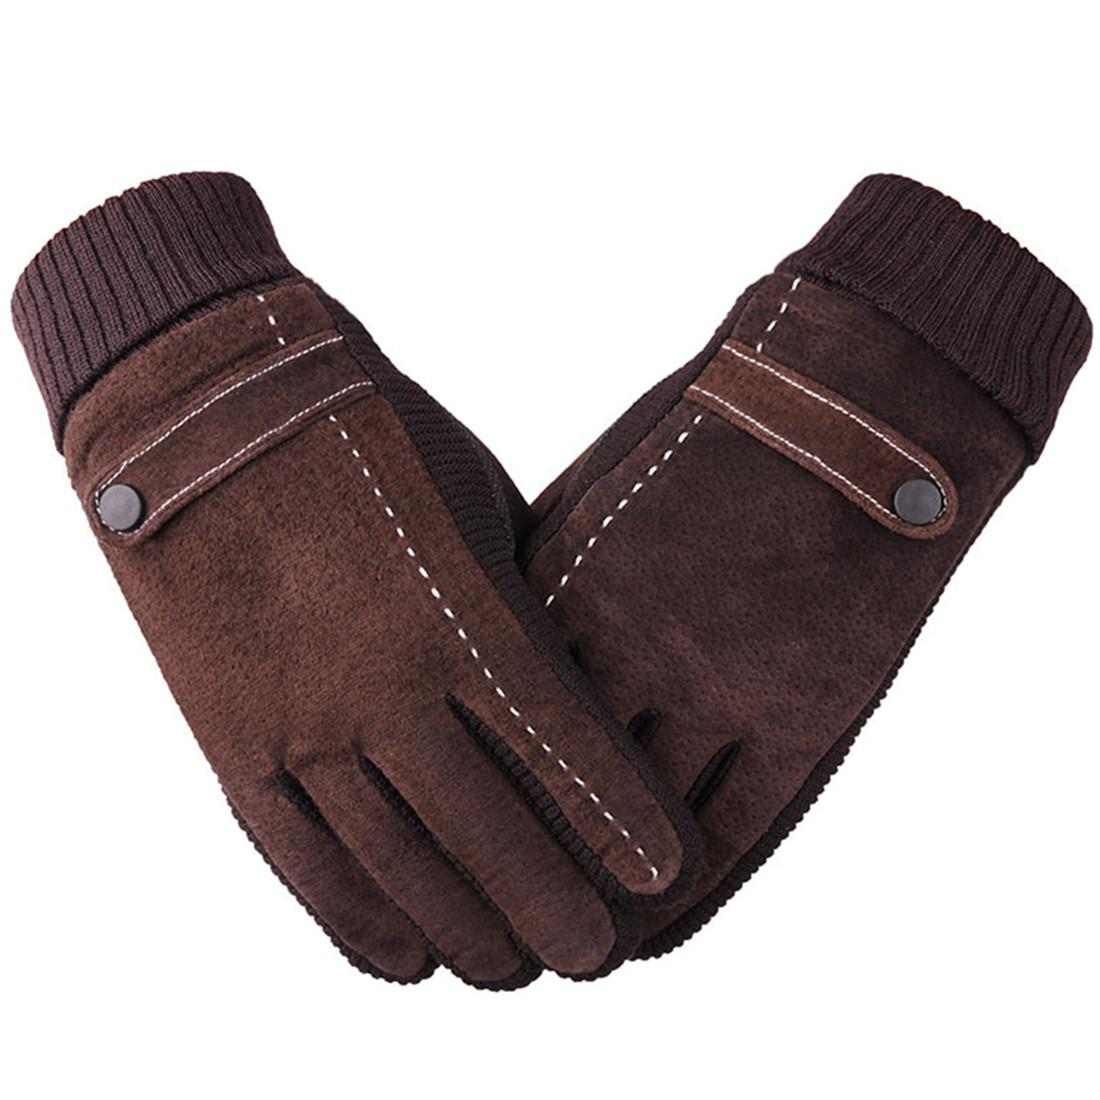 Winter Warm Men's Suede Leather Glove Thicken Plus Velvet Riding Windproof Driver Glove Outdoor Gloves Touch Screen Gloves